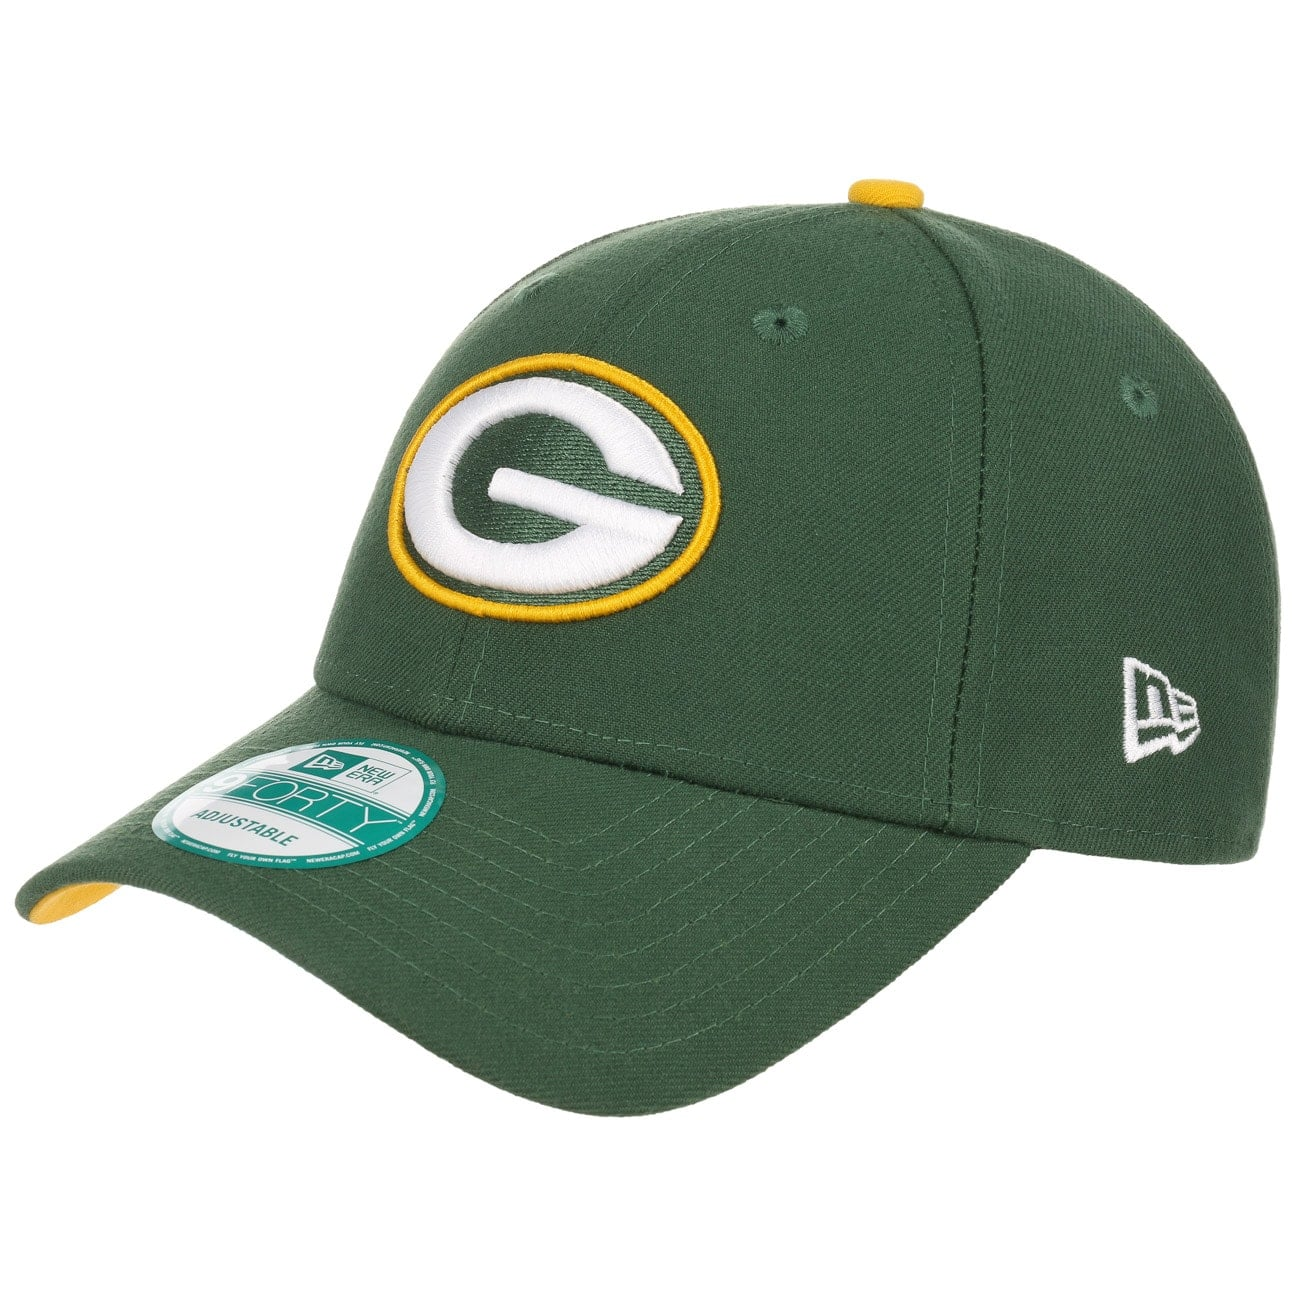 9Forty Green Bay Packers Cap by New Era  gorra de b?isbol